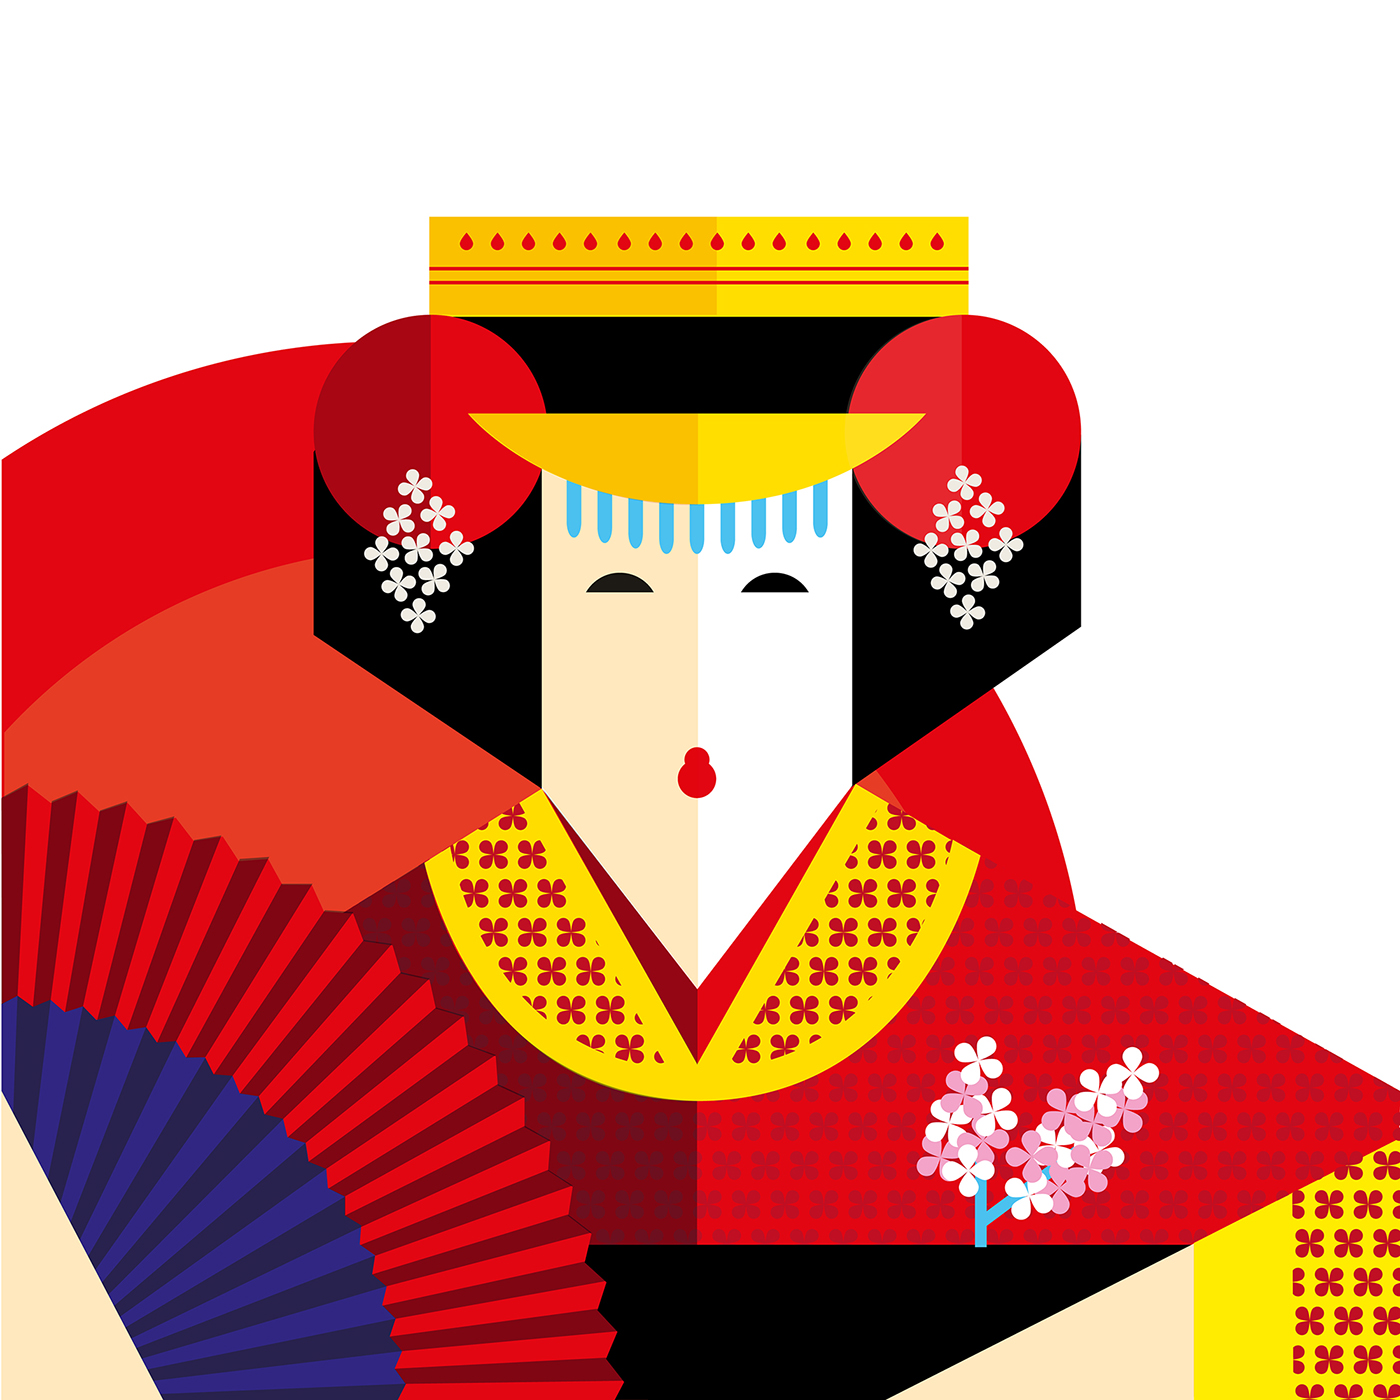 Made in china on behance is the chinese wedding symbol buycottarizona